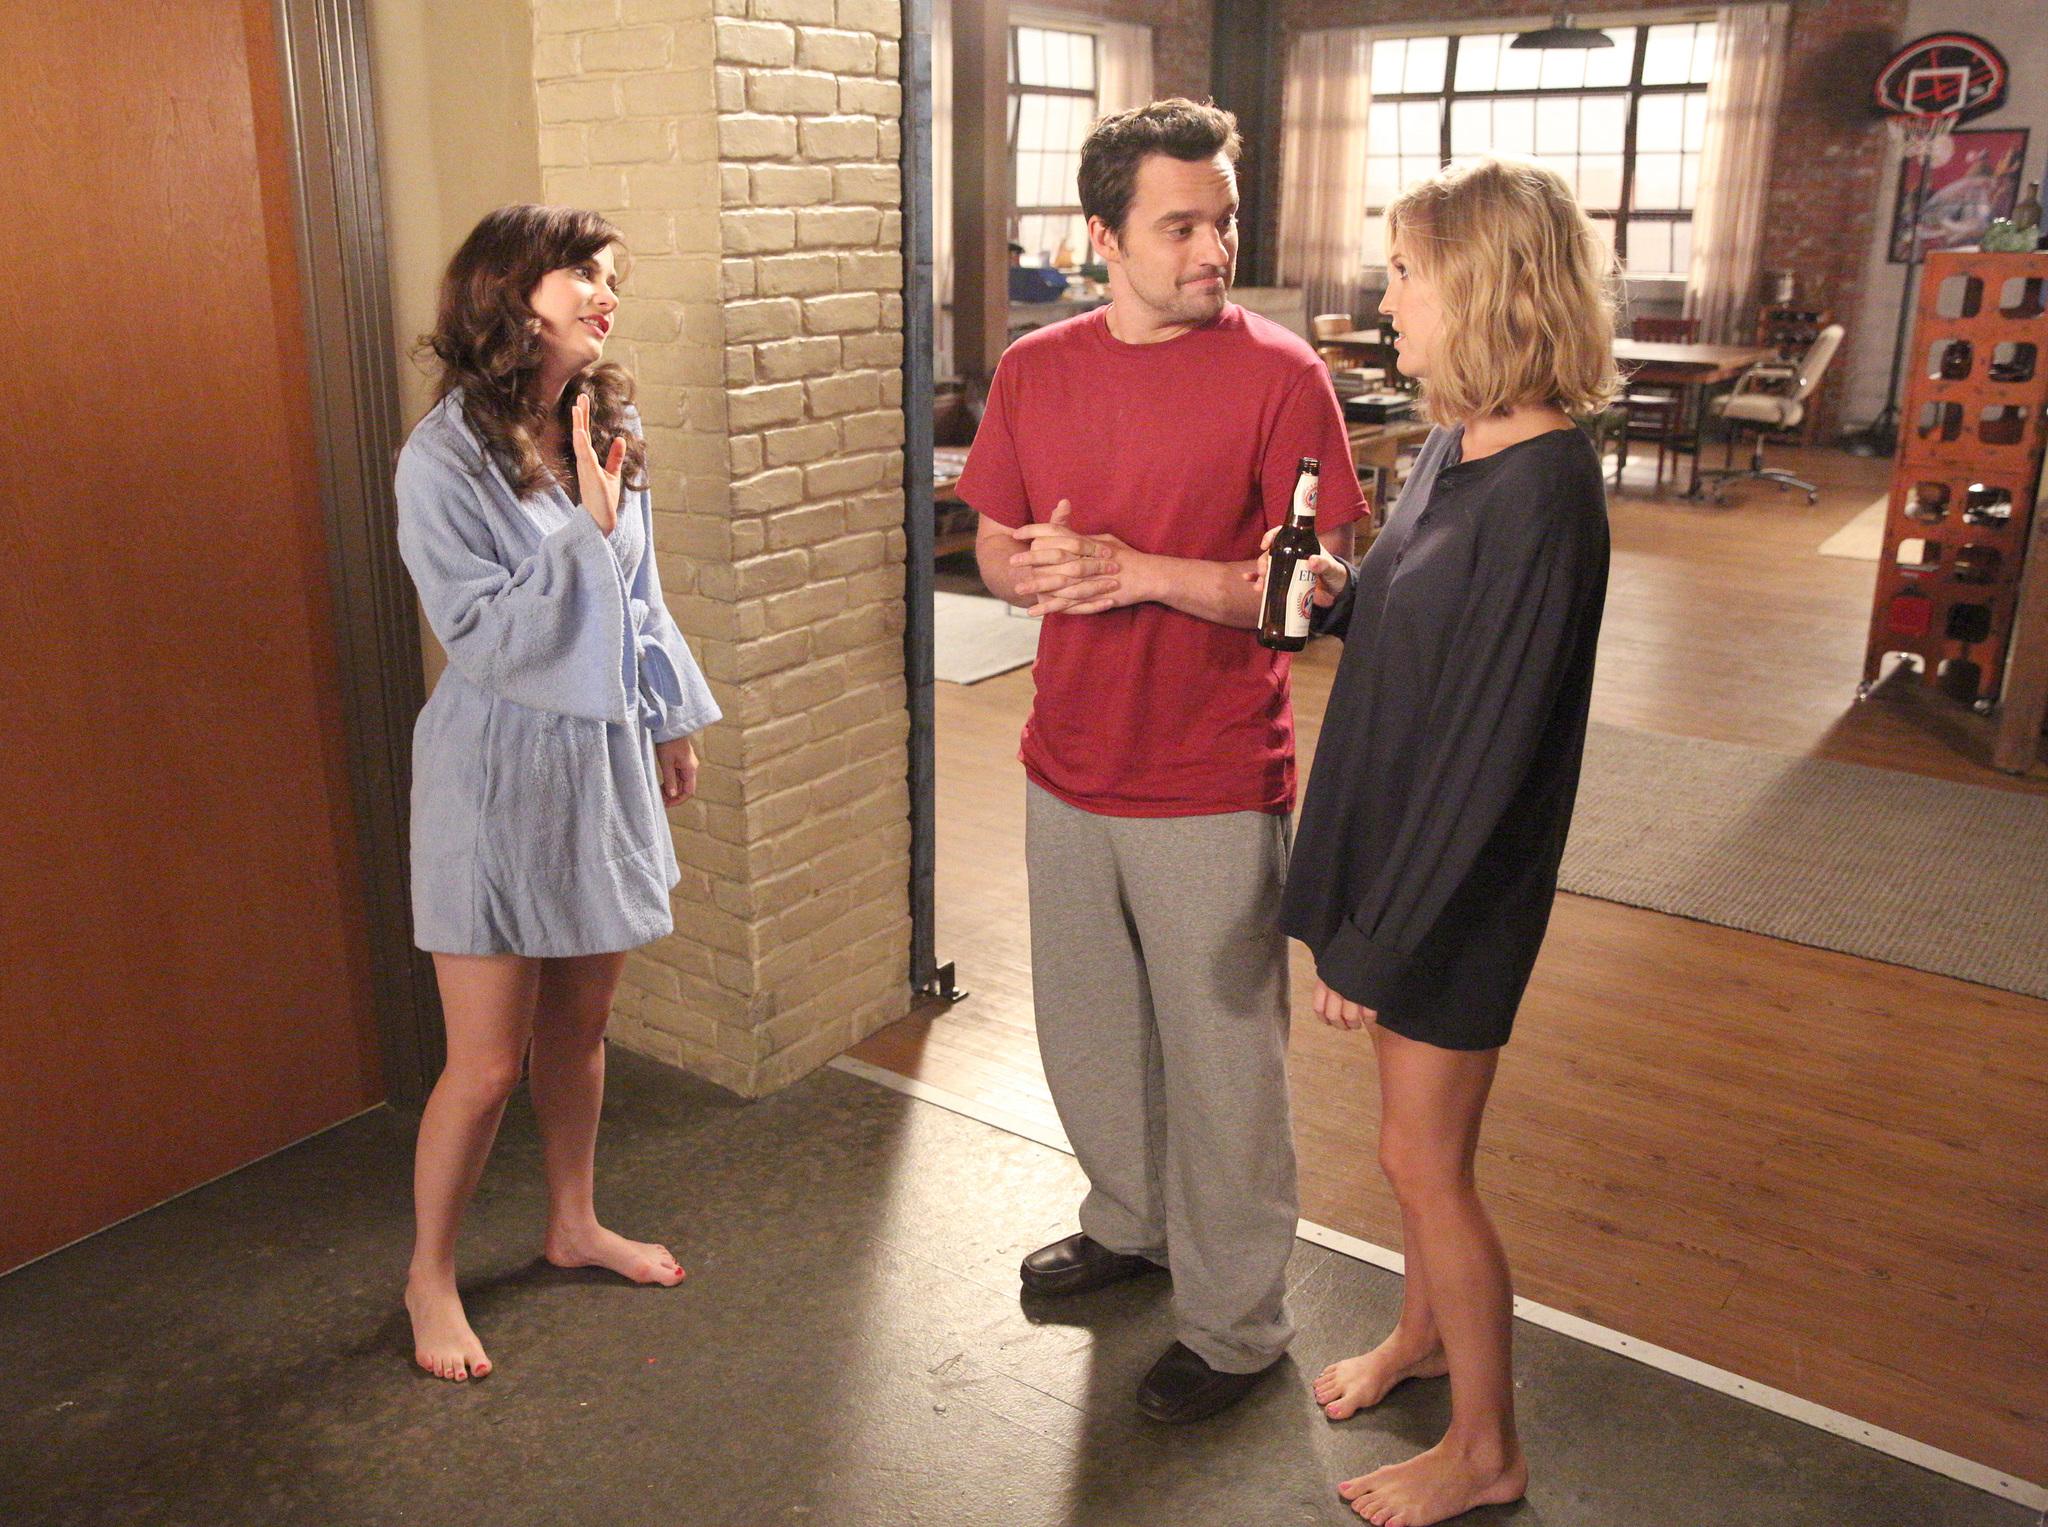 Zooey Deschanel, Amanda Lund, and Jake Johnson in New Girl (2011)